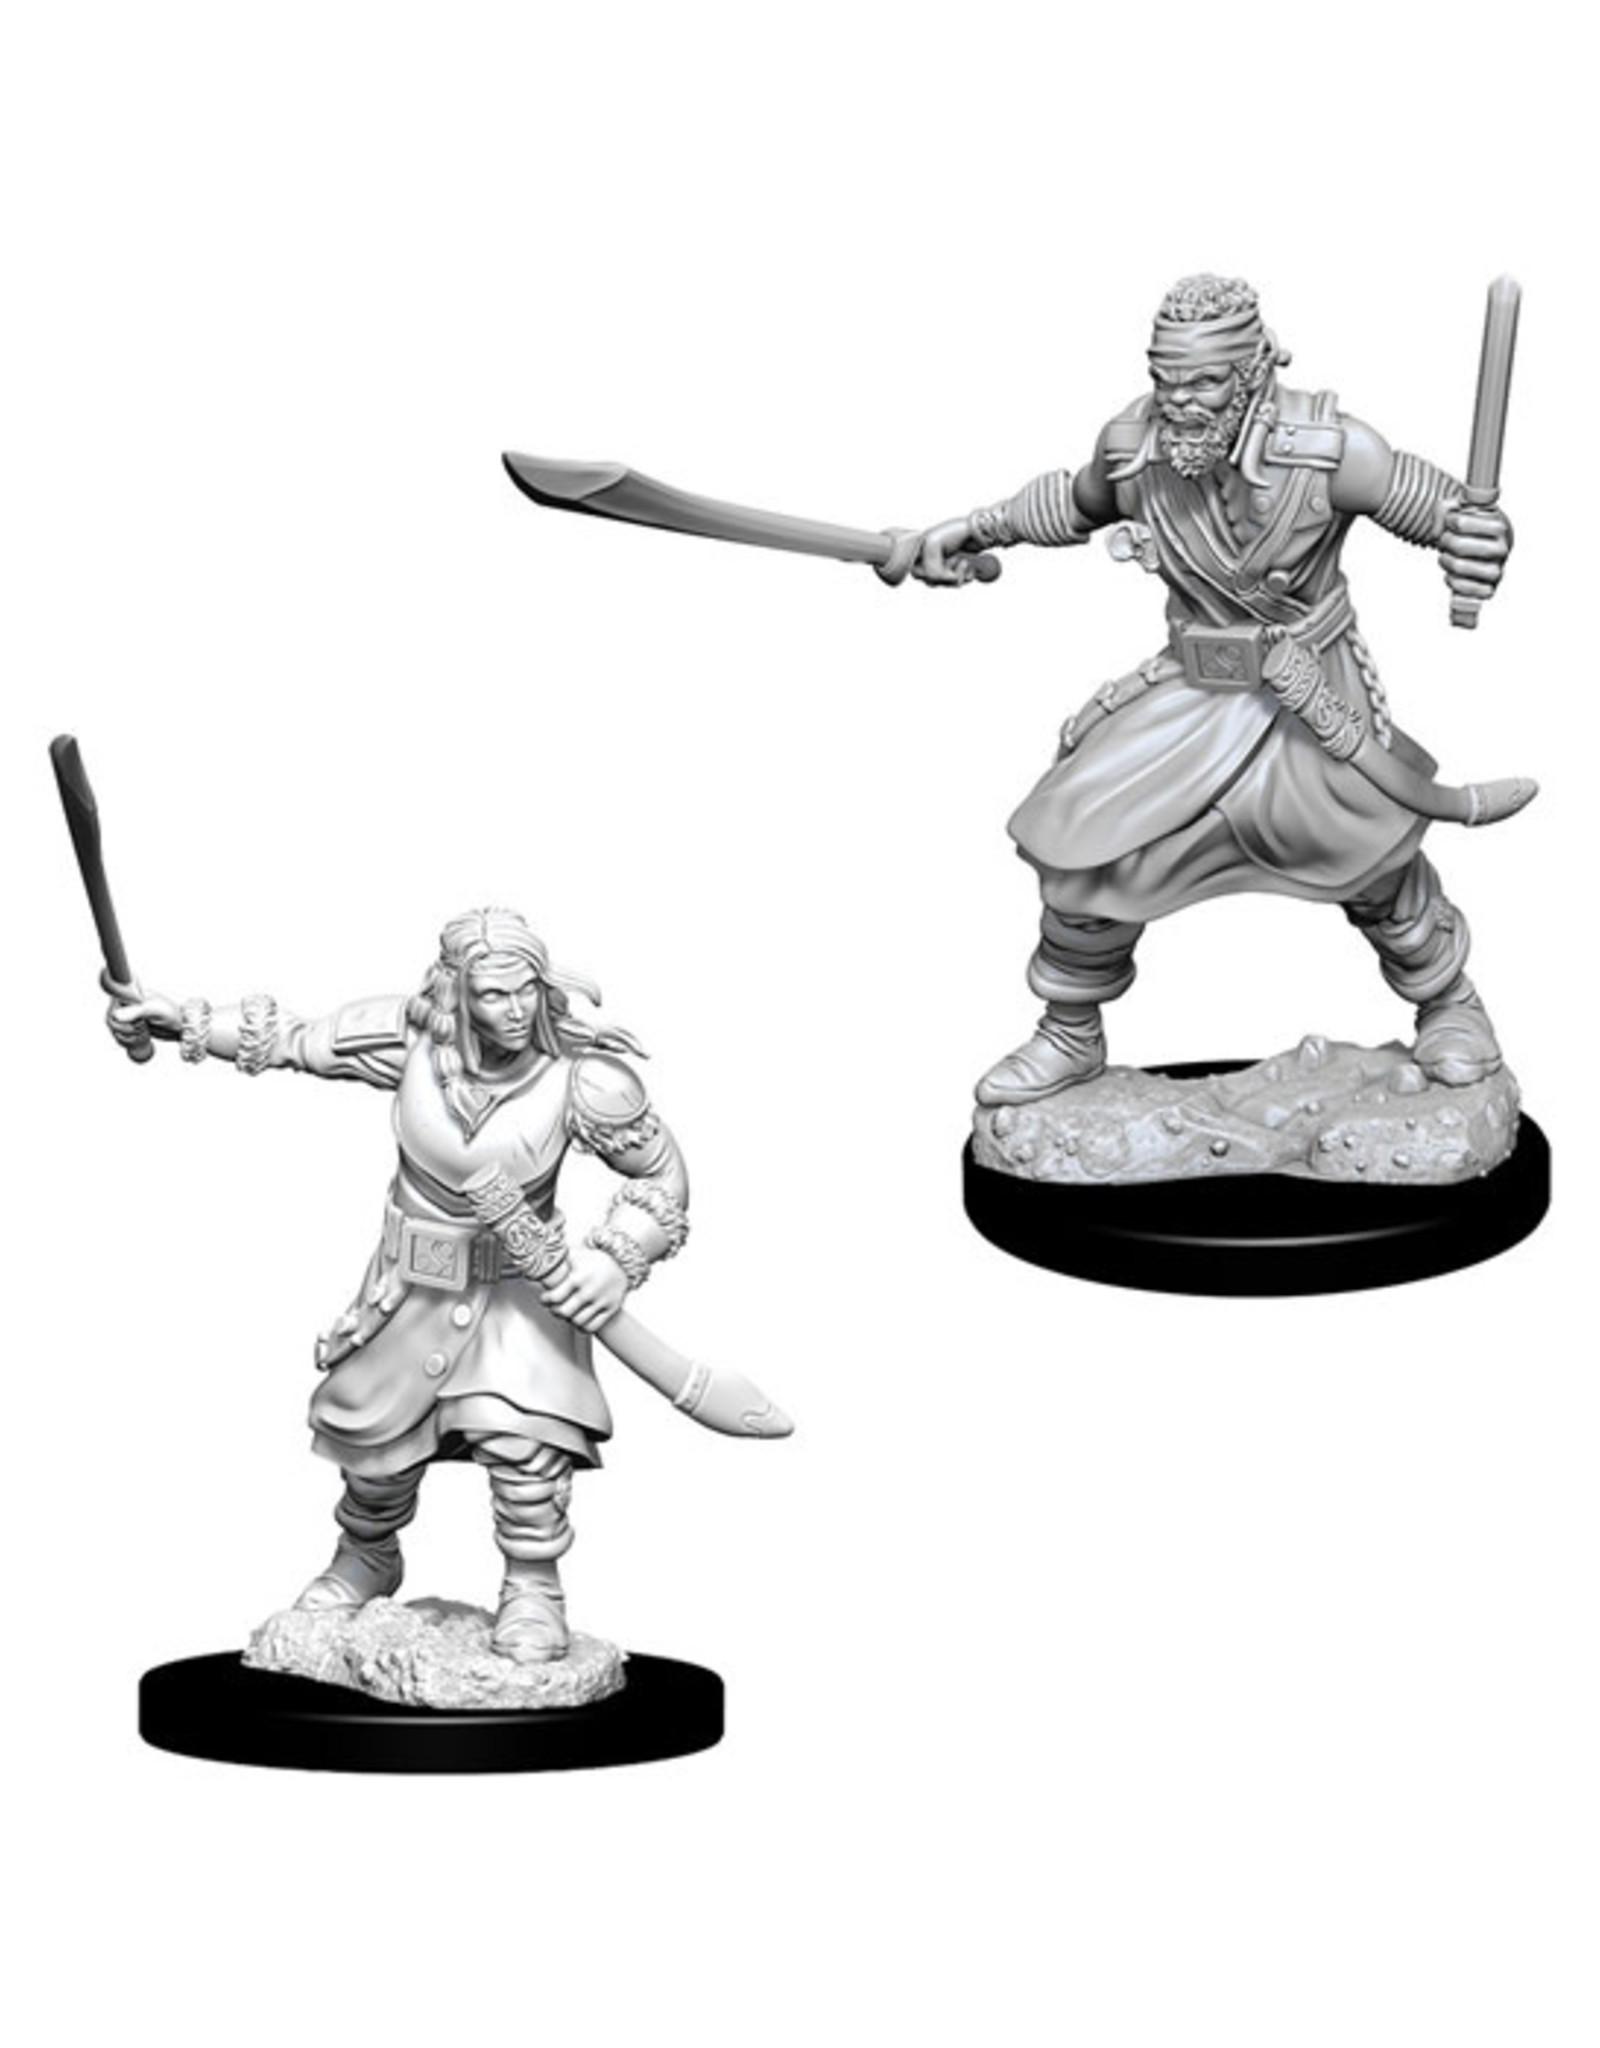 Dungeons & Dragons Dungeons & Dragons: Nolzur's - Bandits